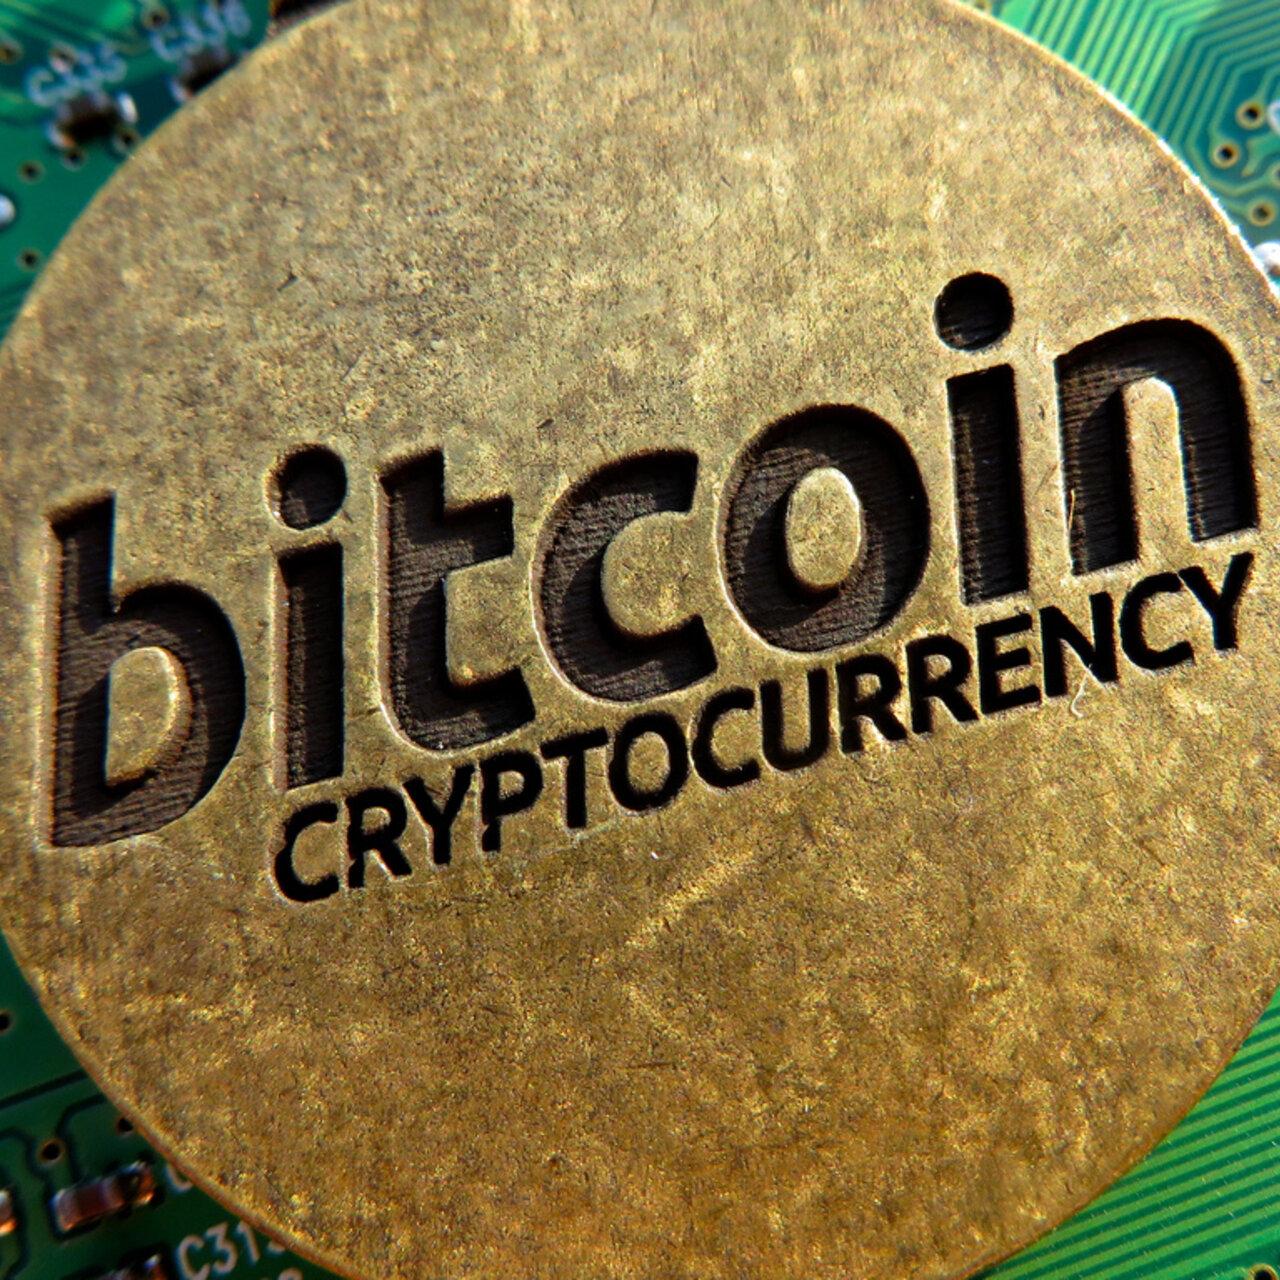 Top 3 Price Prediction Bitcoin, Ripple, Ethereum: Altcoins